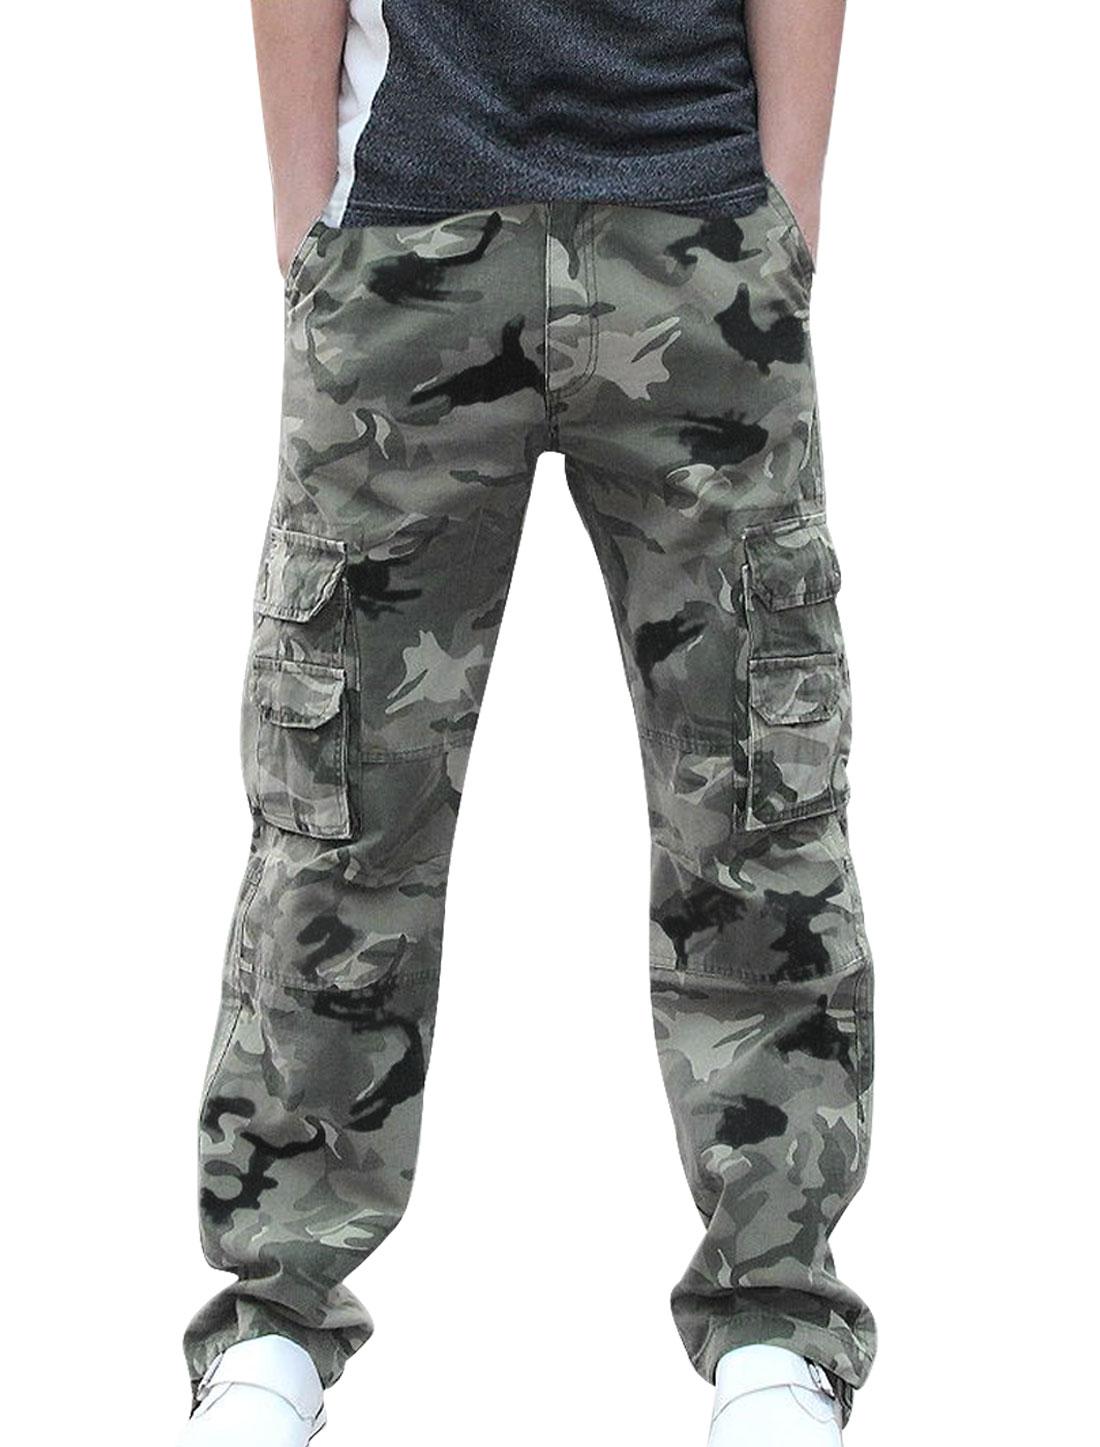 Mens Fashion Camouflage Printed Six Pockets Dark Green Gray Pants W37